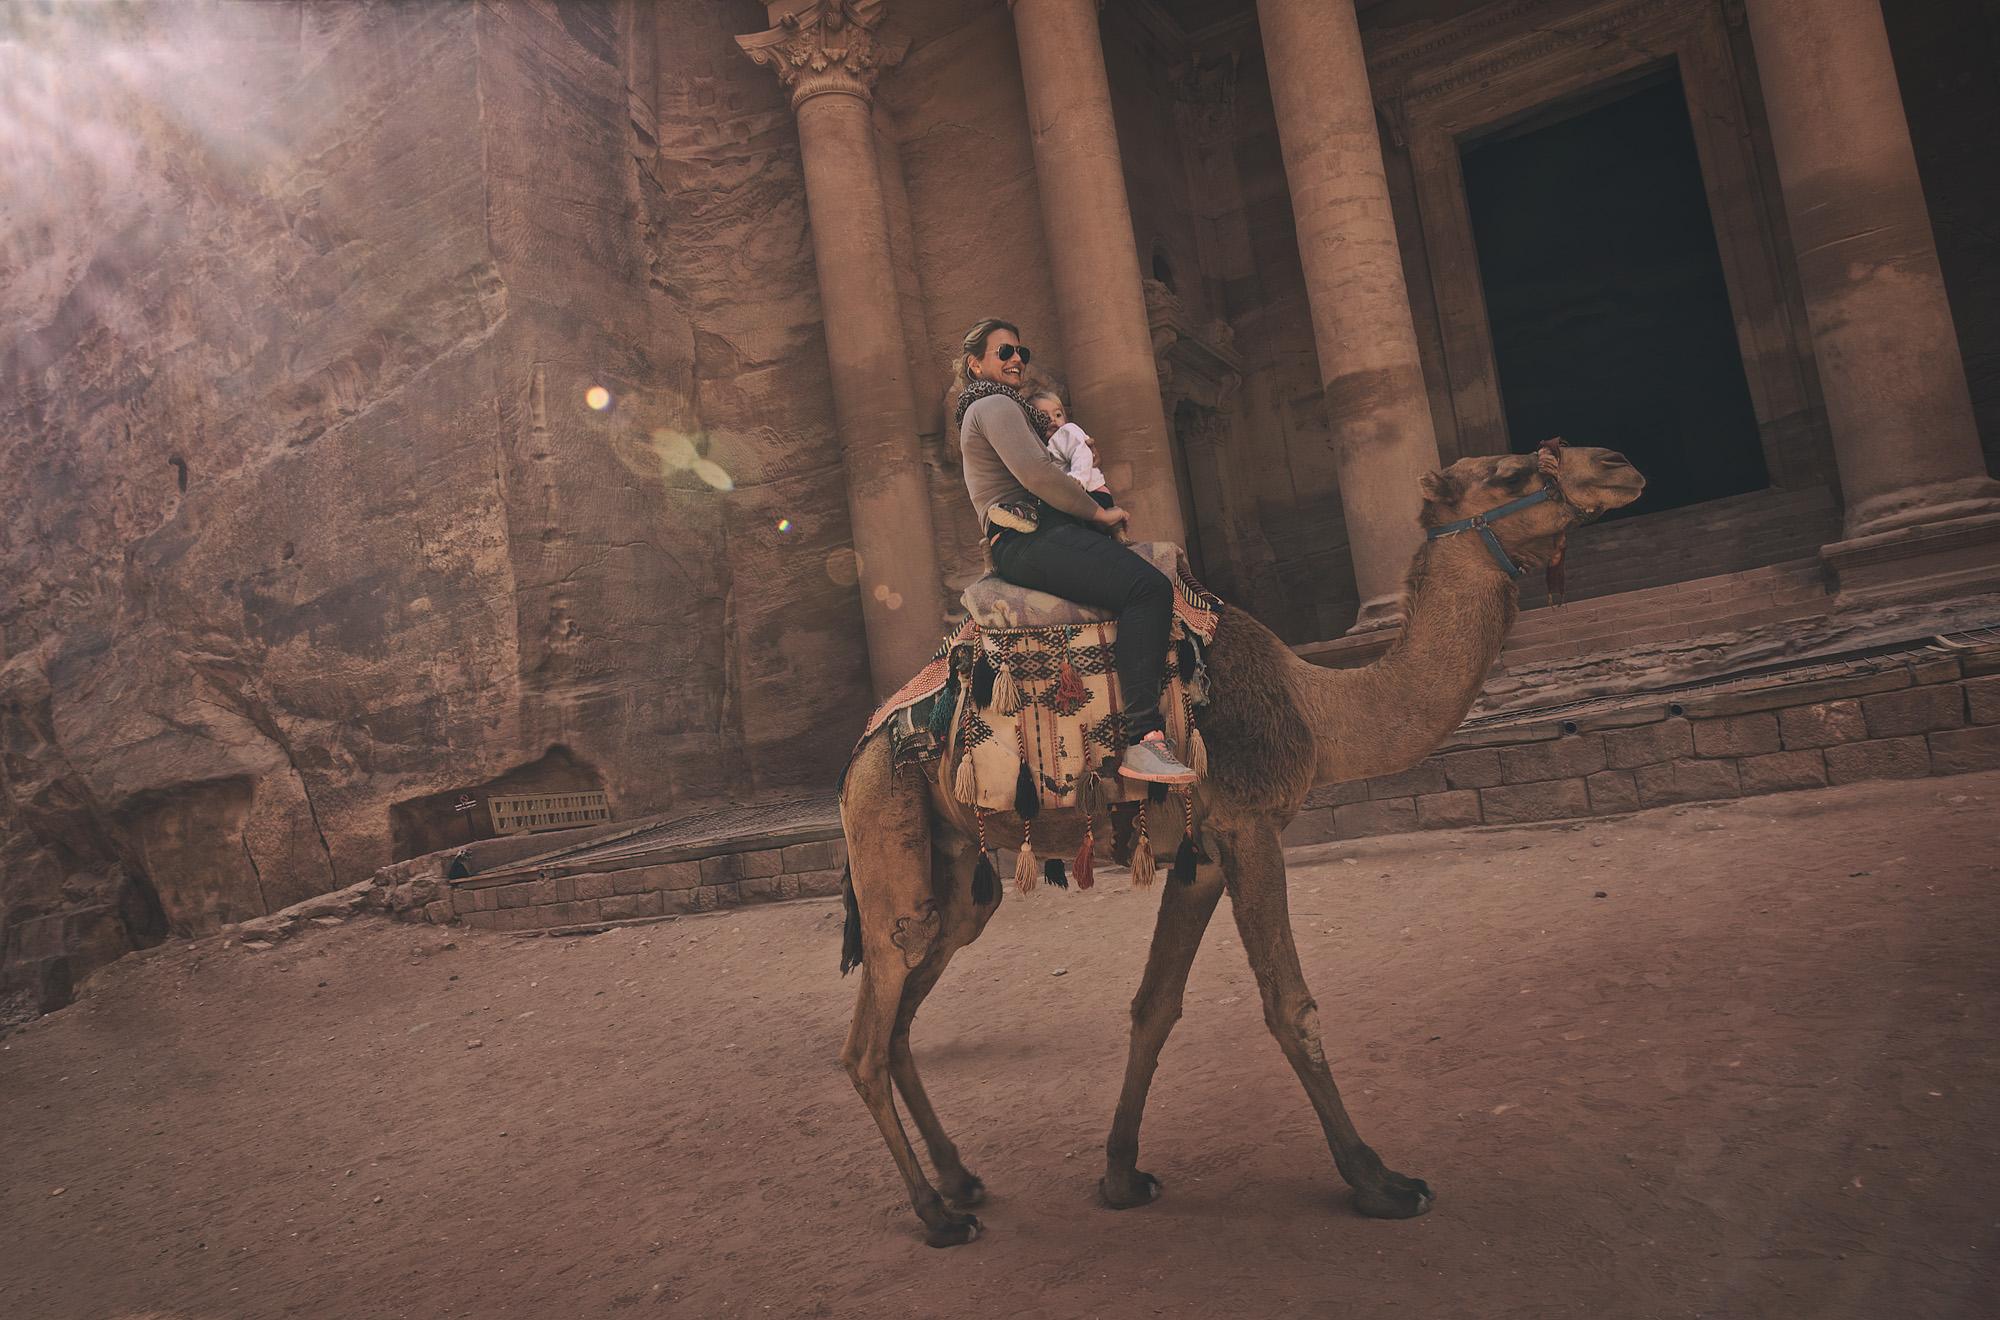 staden Petra